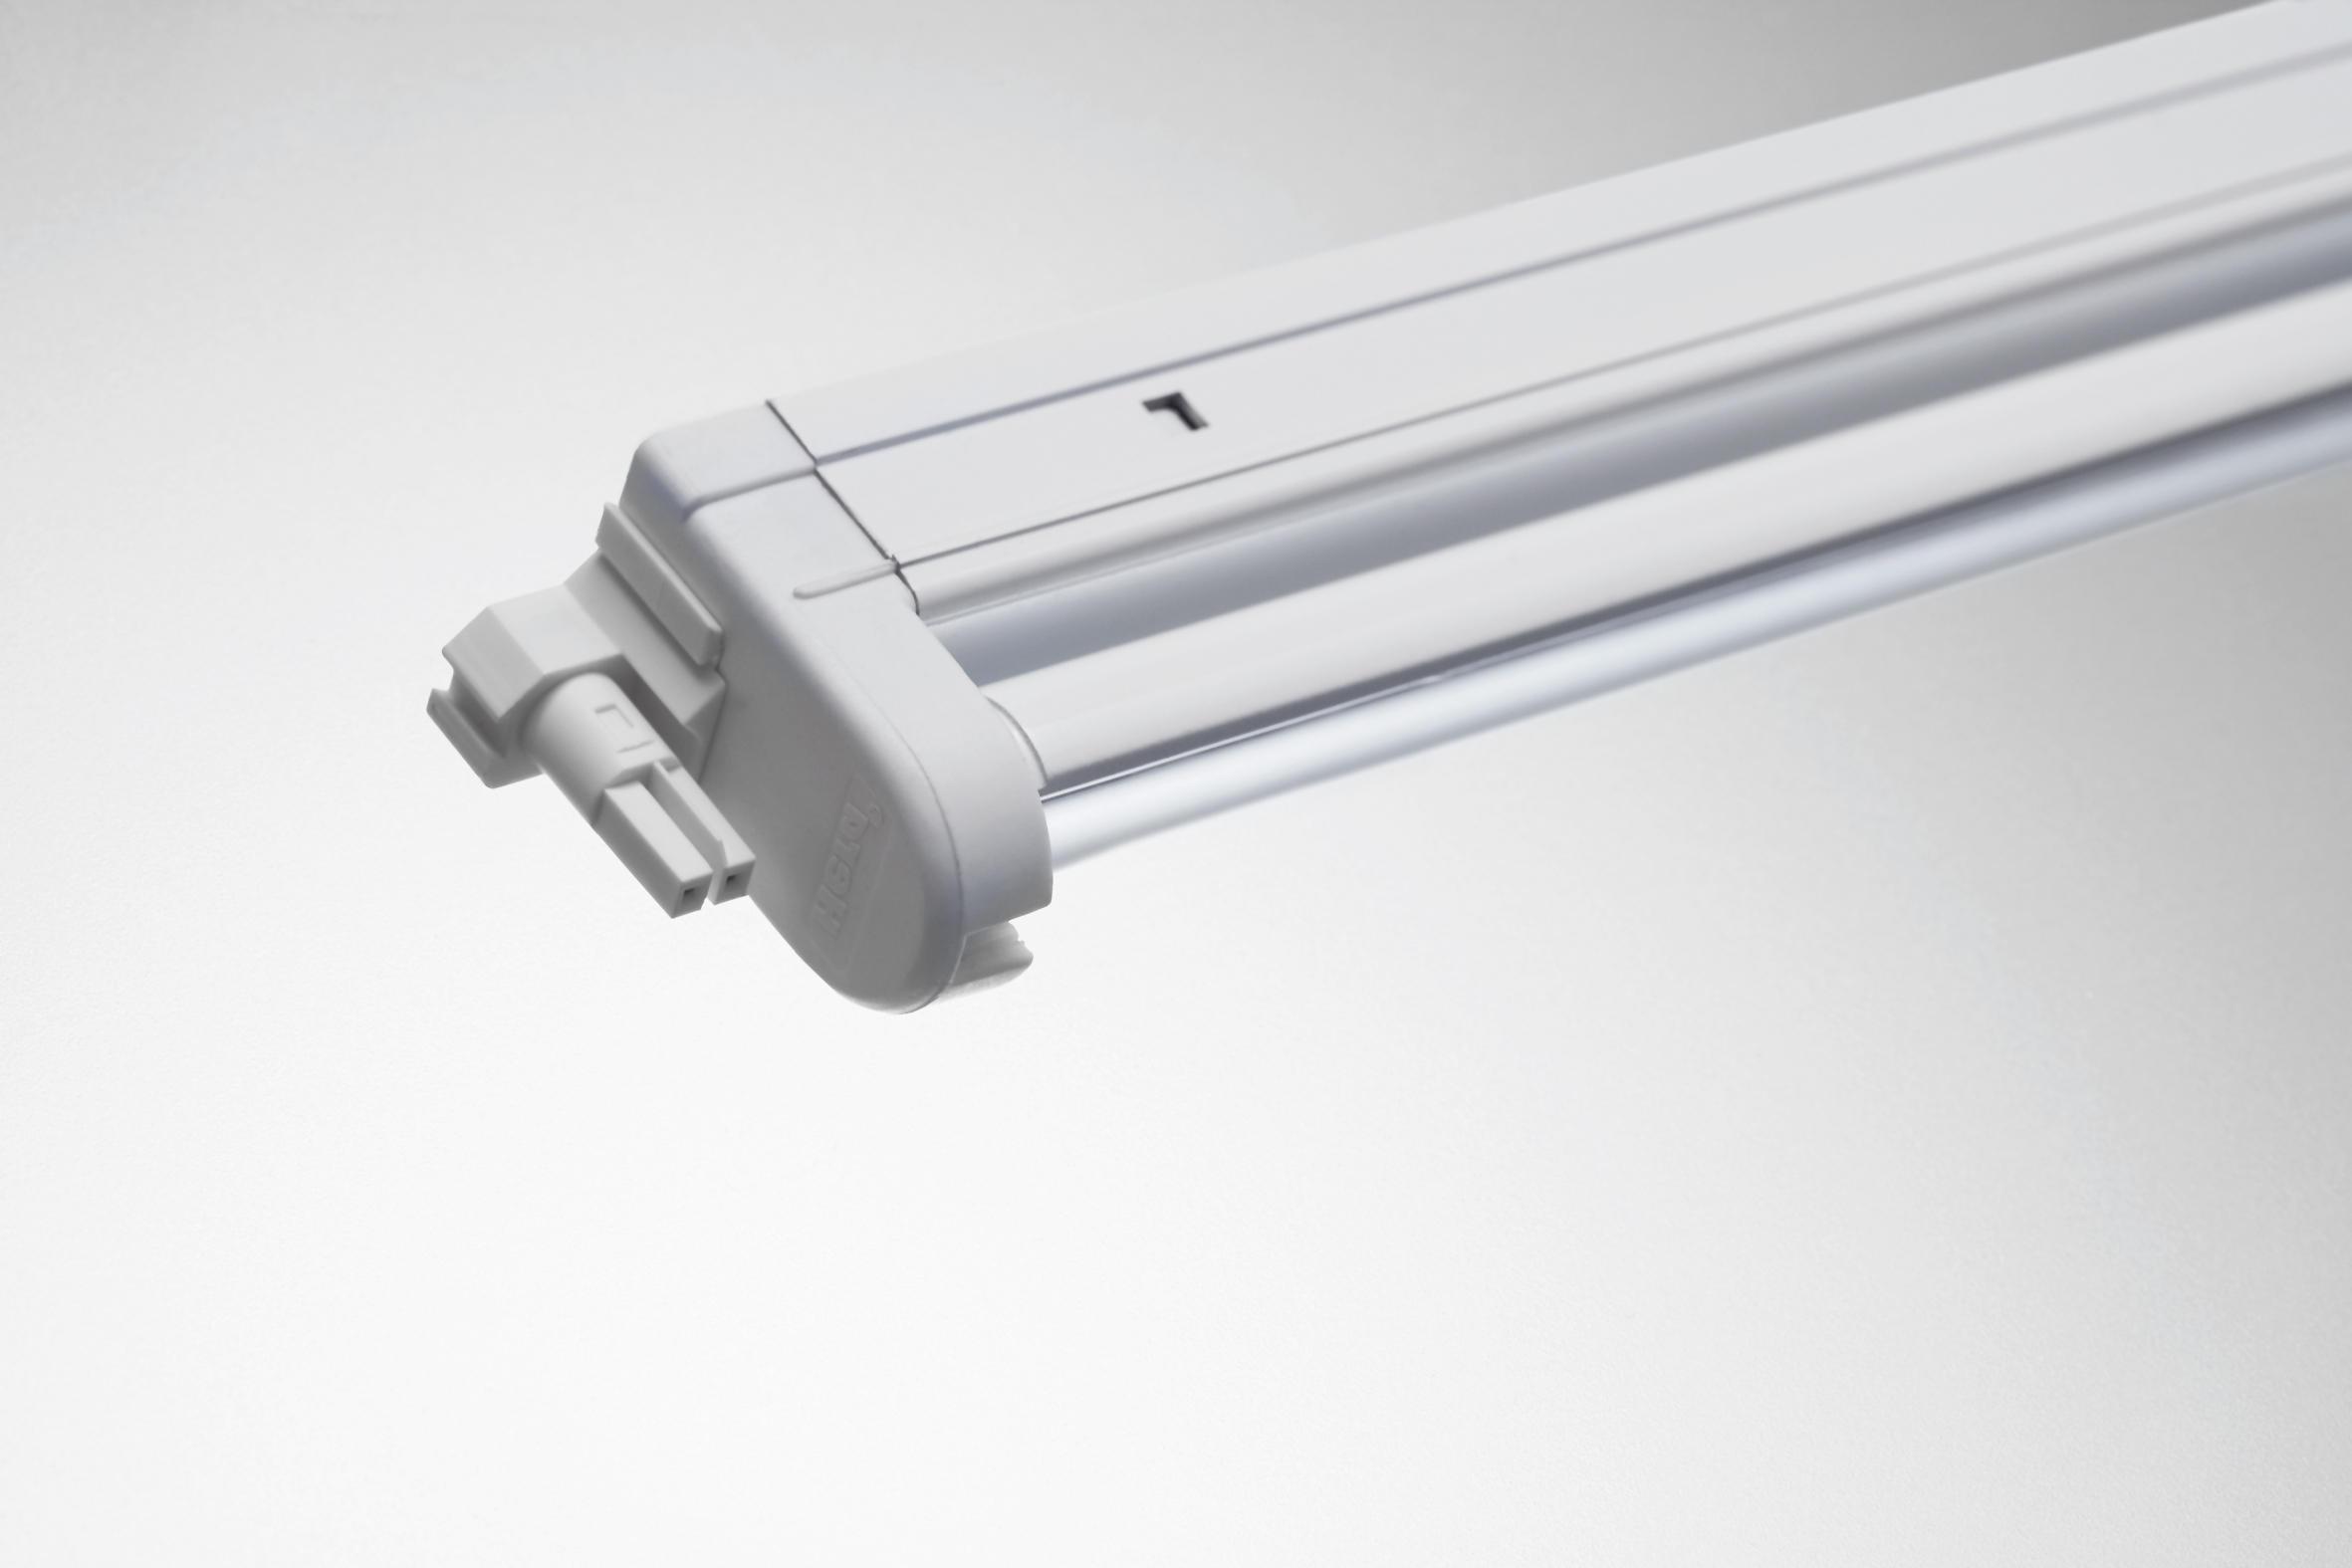 ... SlimLite® CS LED by Hera   LED-lights ... & SLIMLITE® CS LED - LED-lights from Hera   Architonic azcodes.com